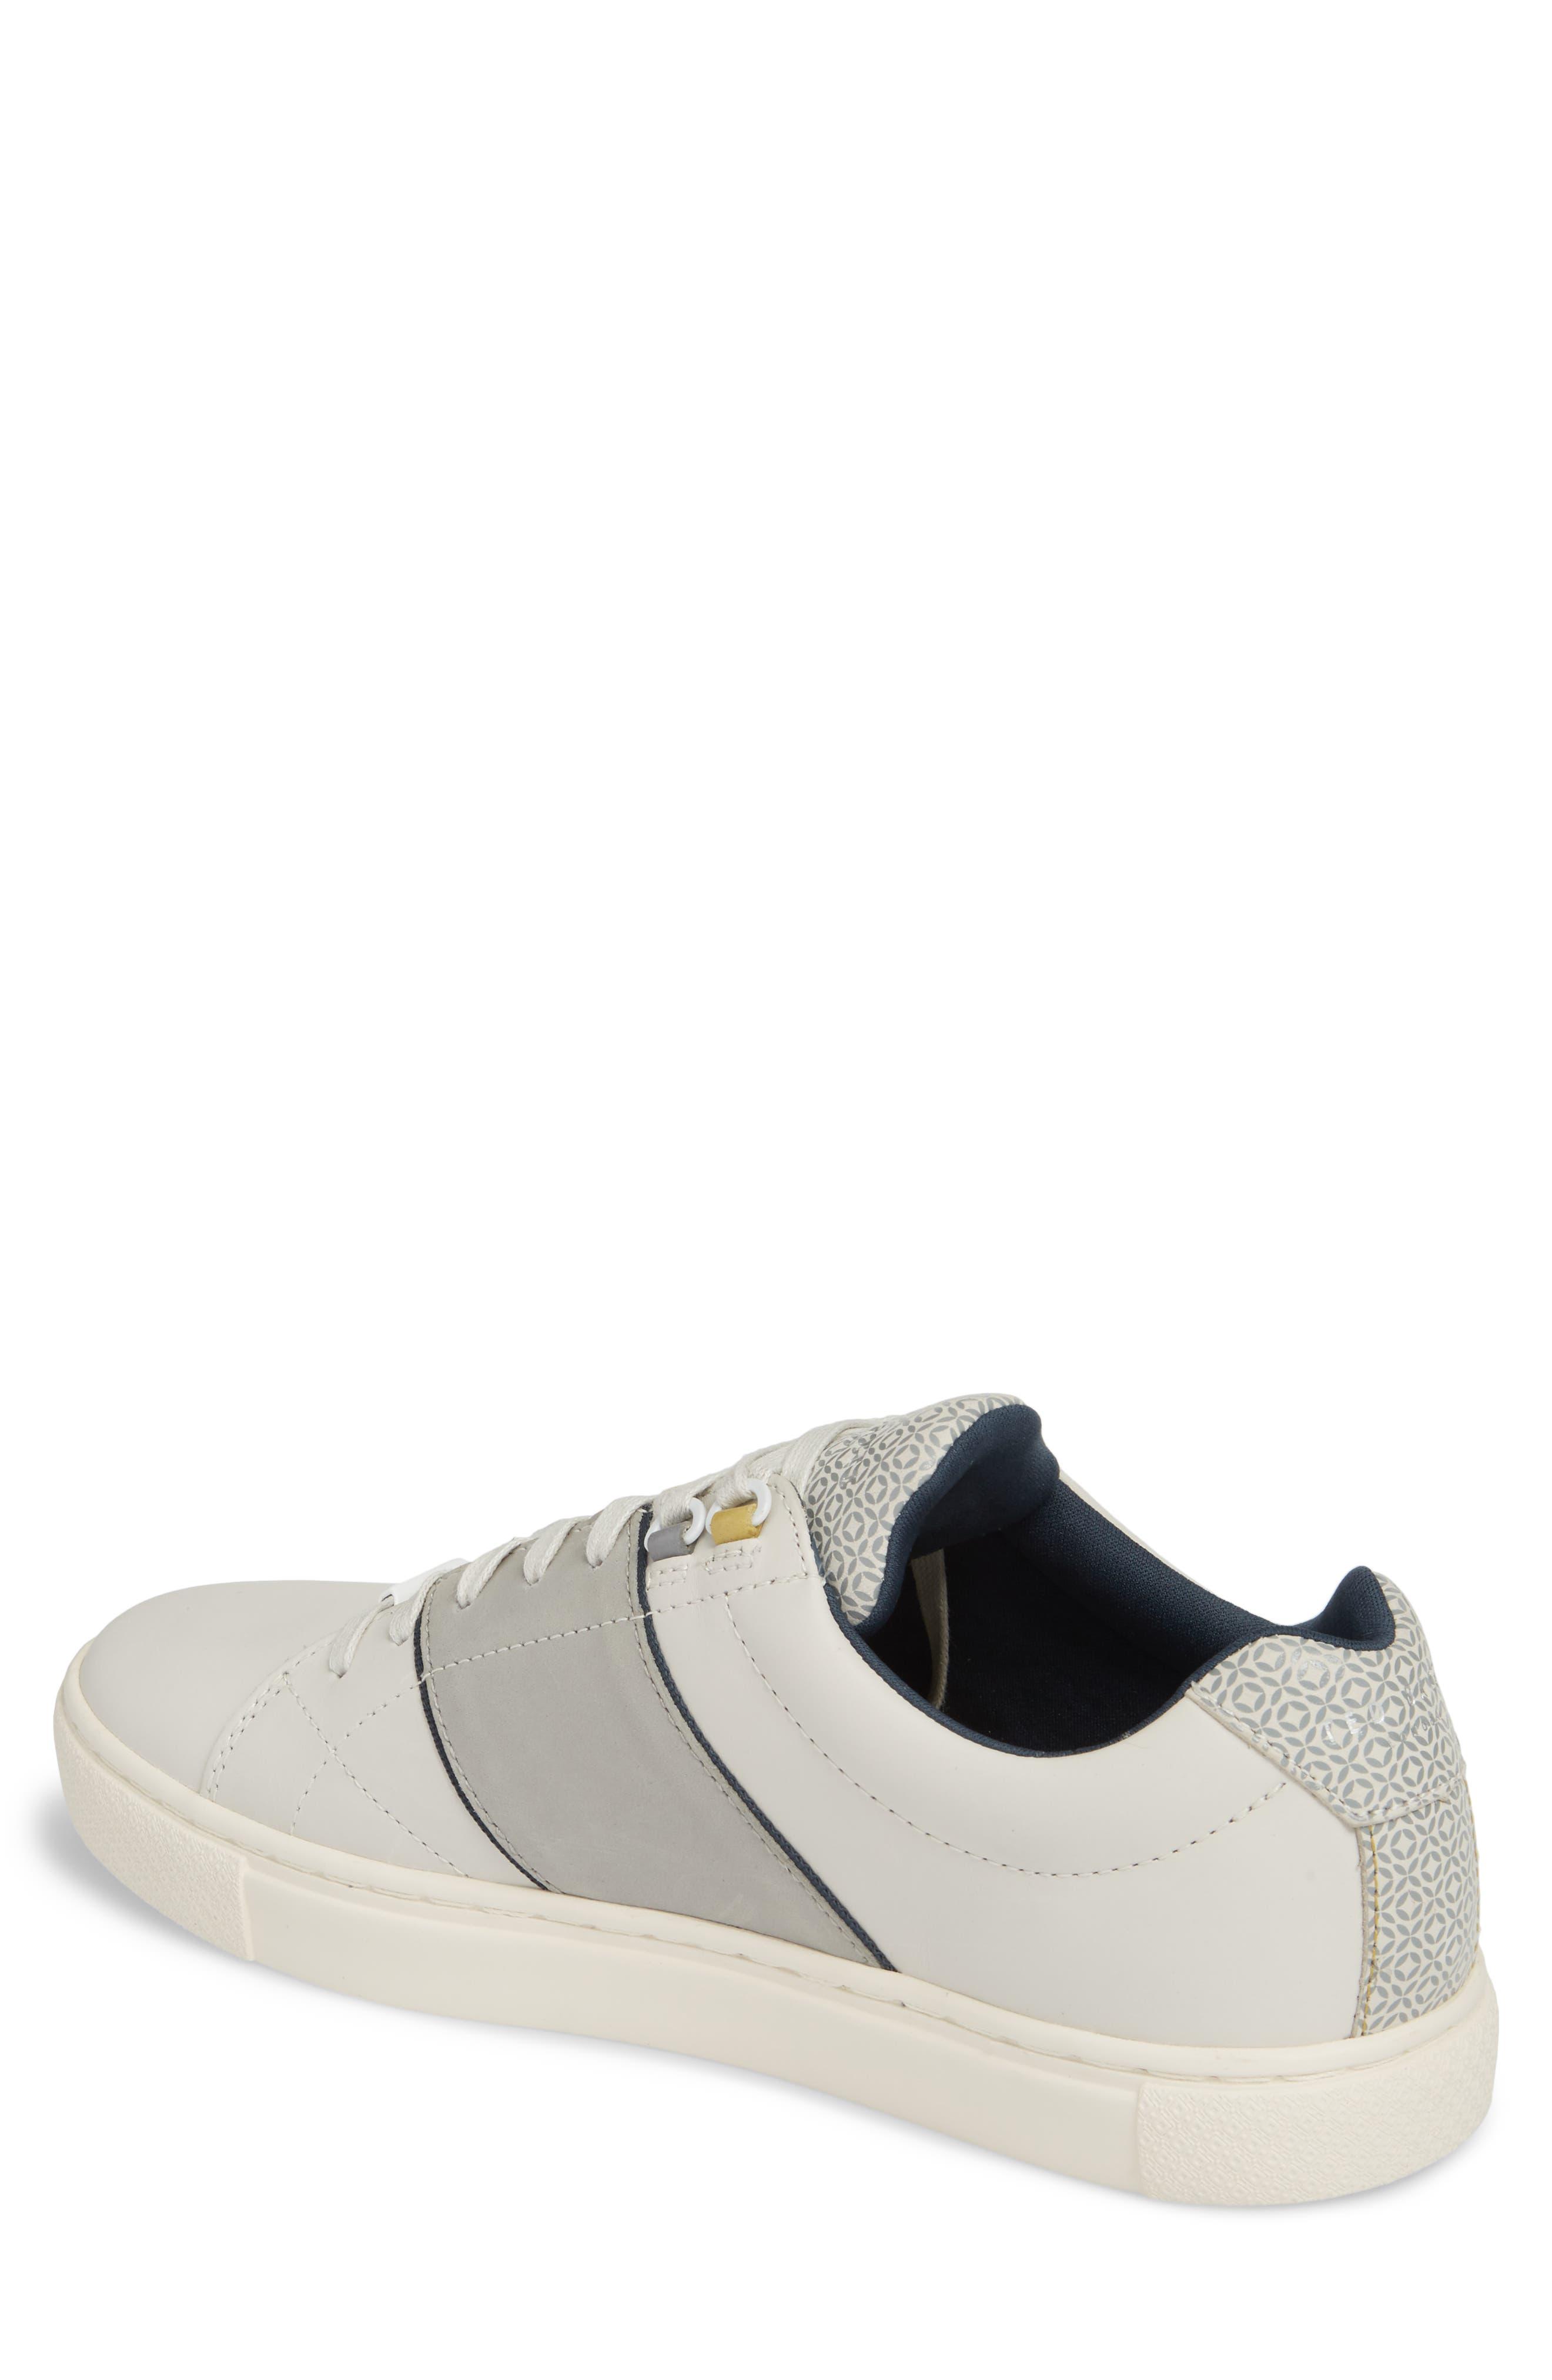 Ted Baker Quana Low Top Sneaker,                             Alternate thumbnail 2, color,                             152